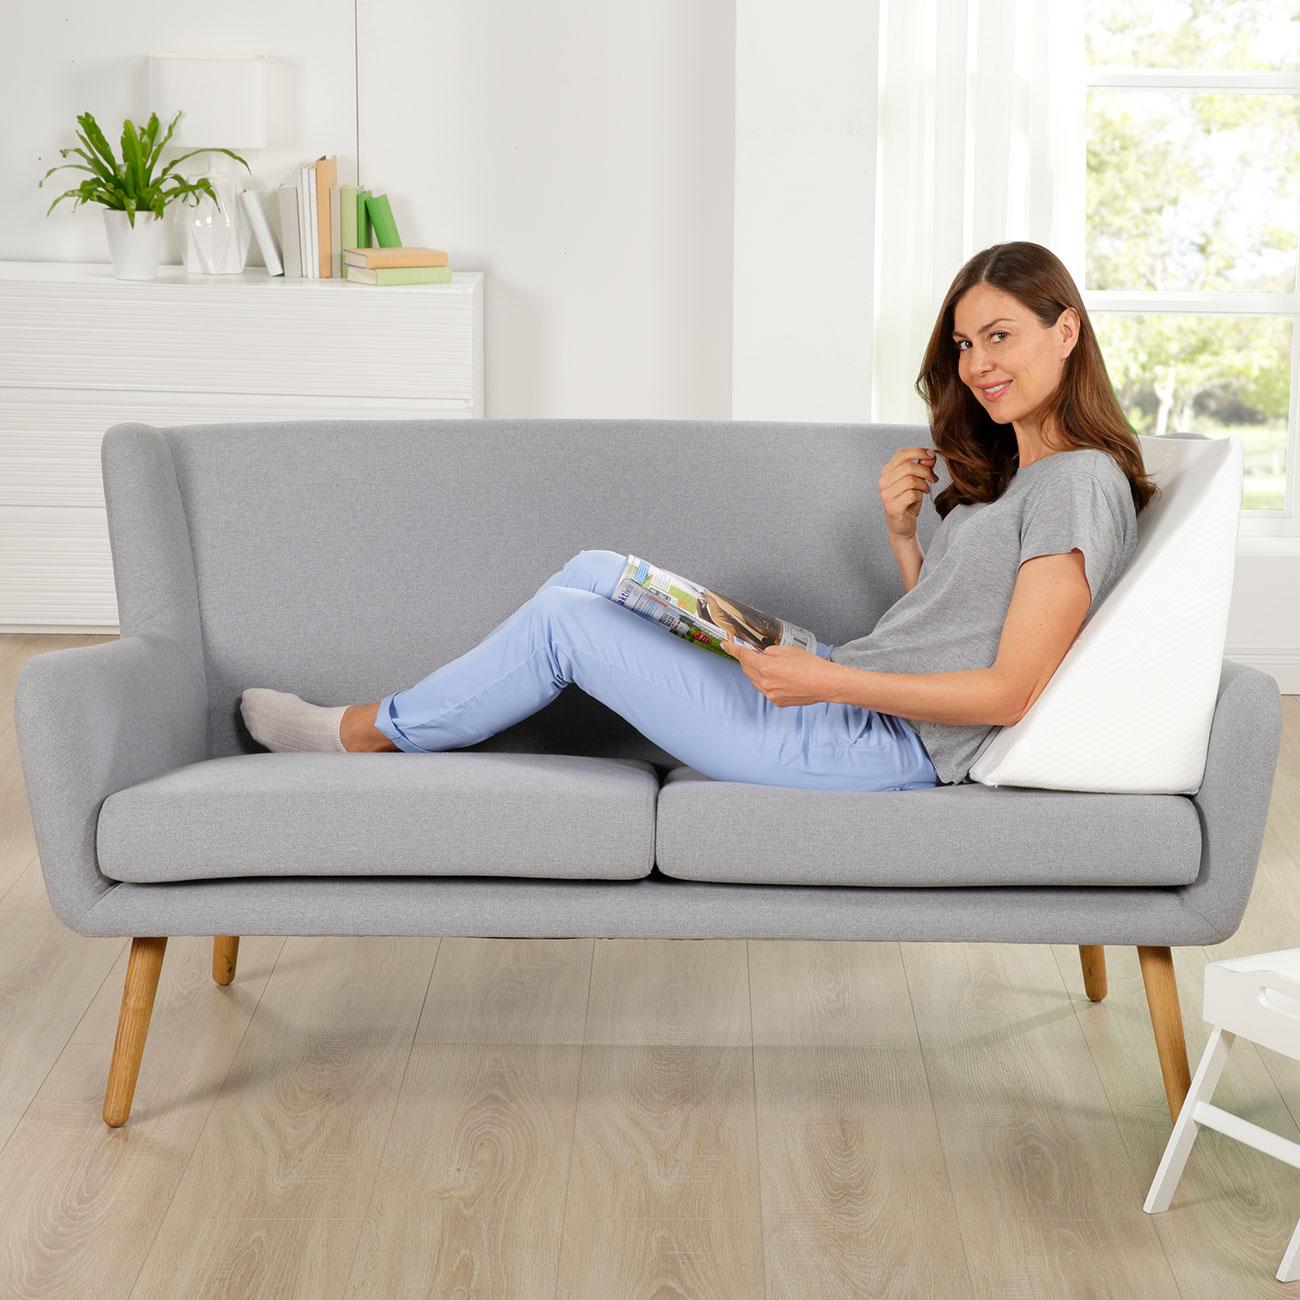 Bett und Sofa Keilkissen